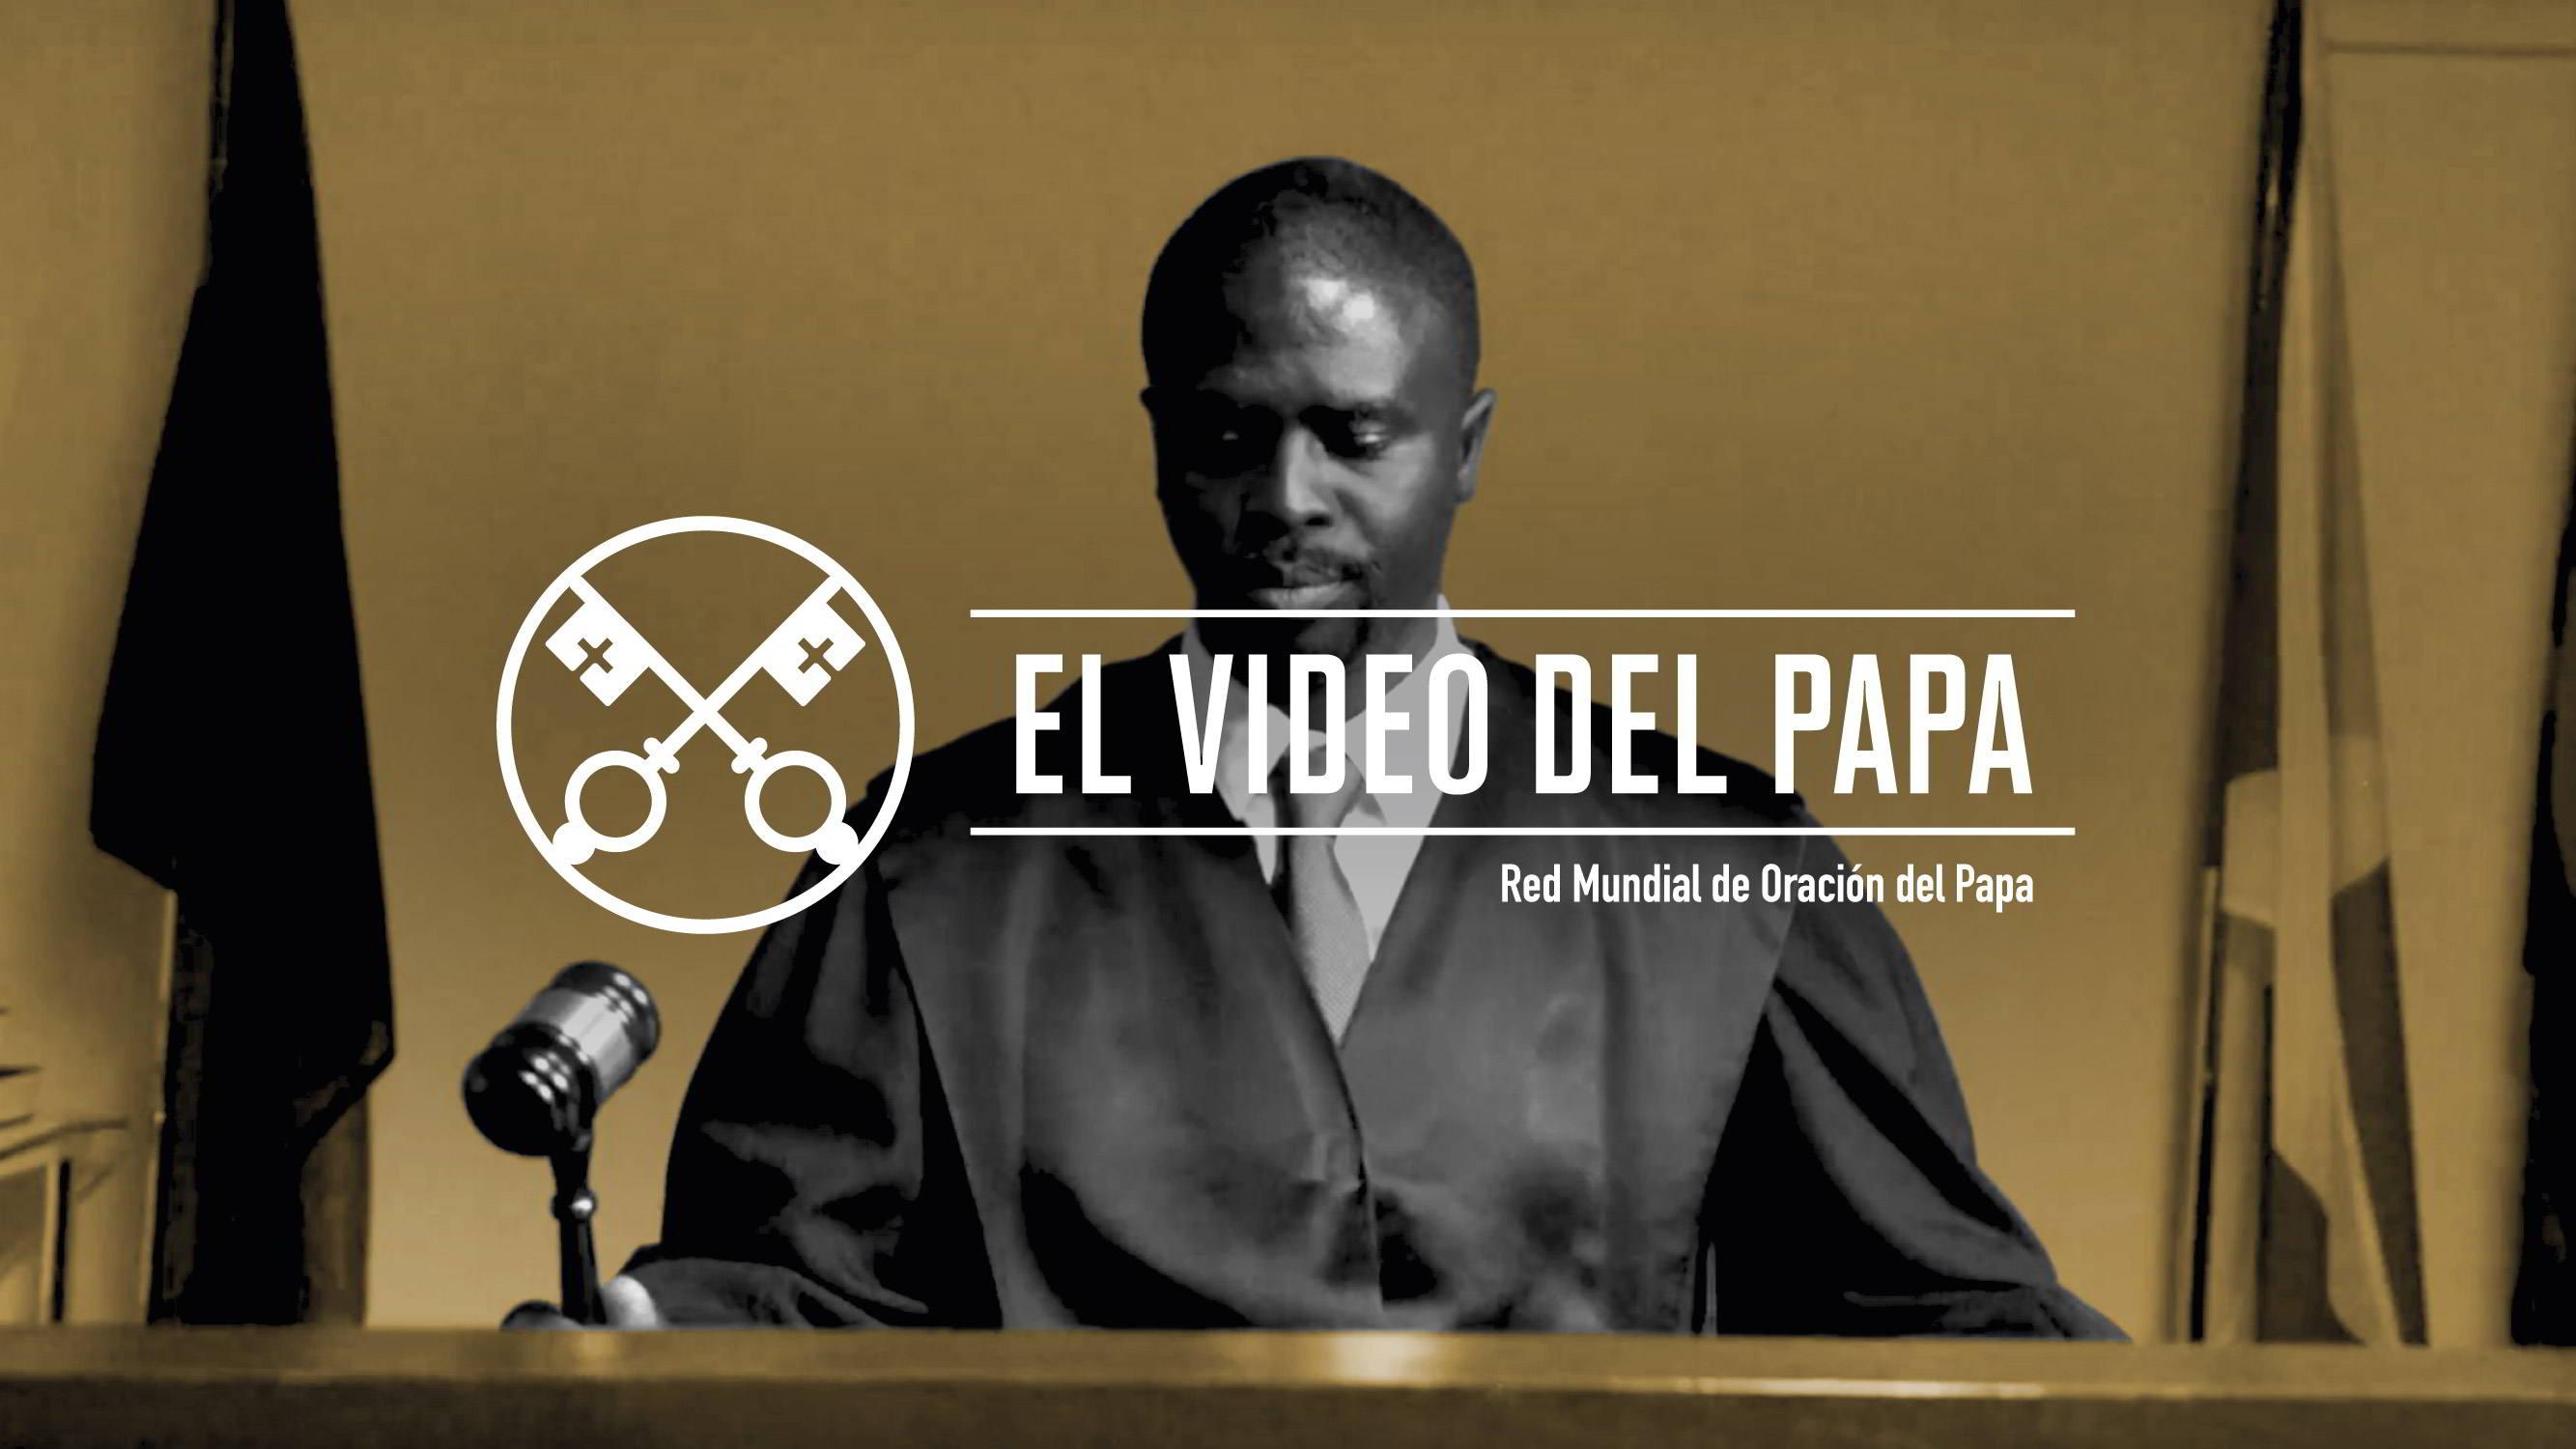 Official-Image-TPV-7-2019-2-ES-Integridad-de-la-Justicia